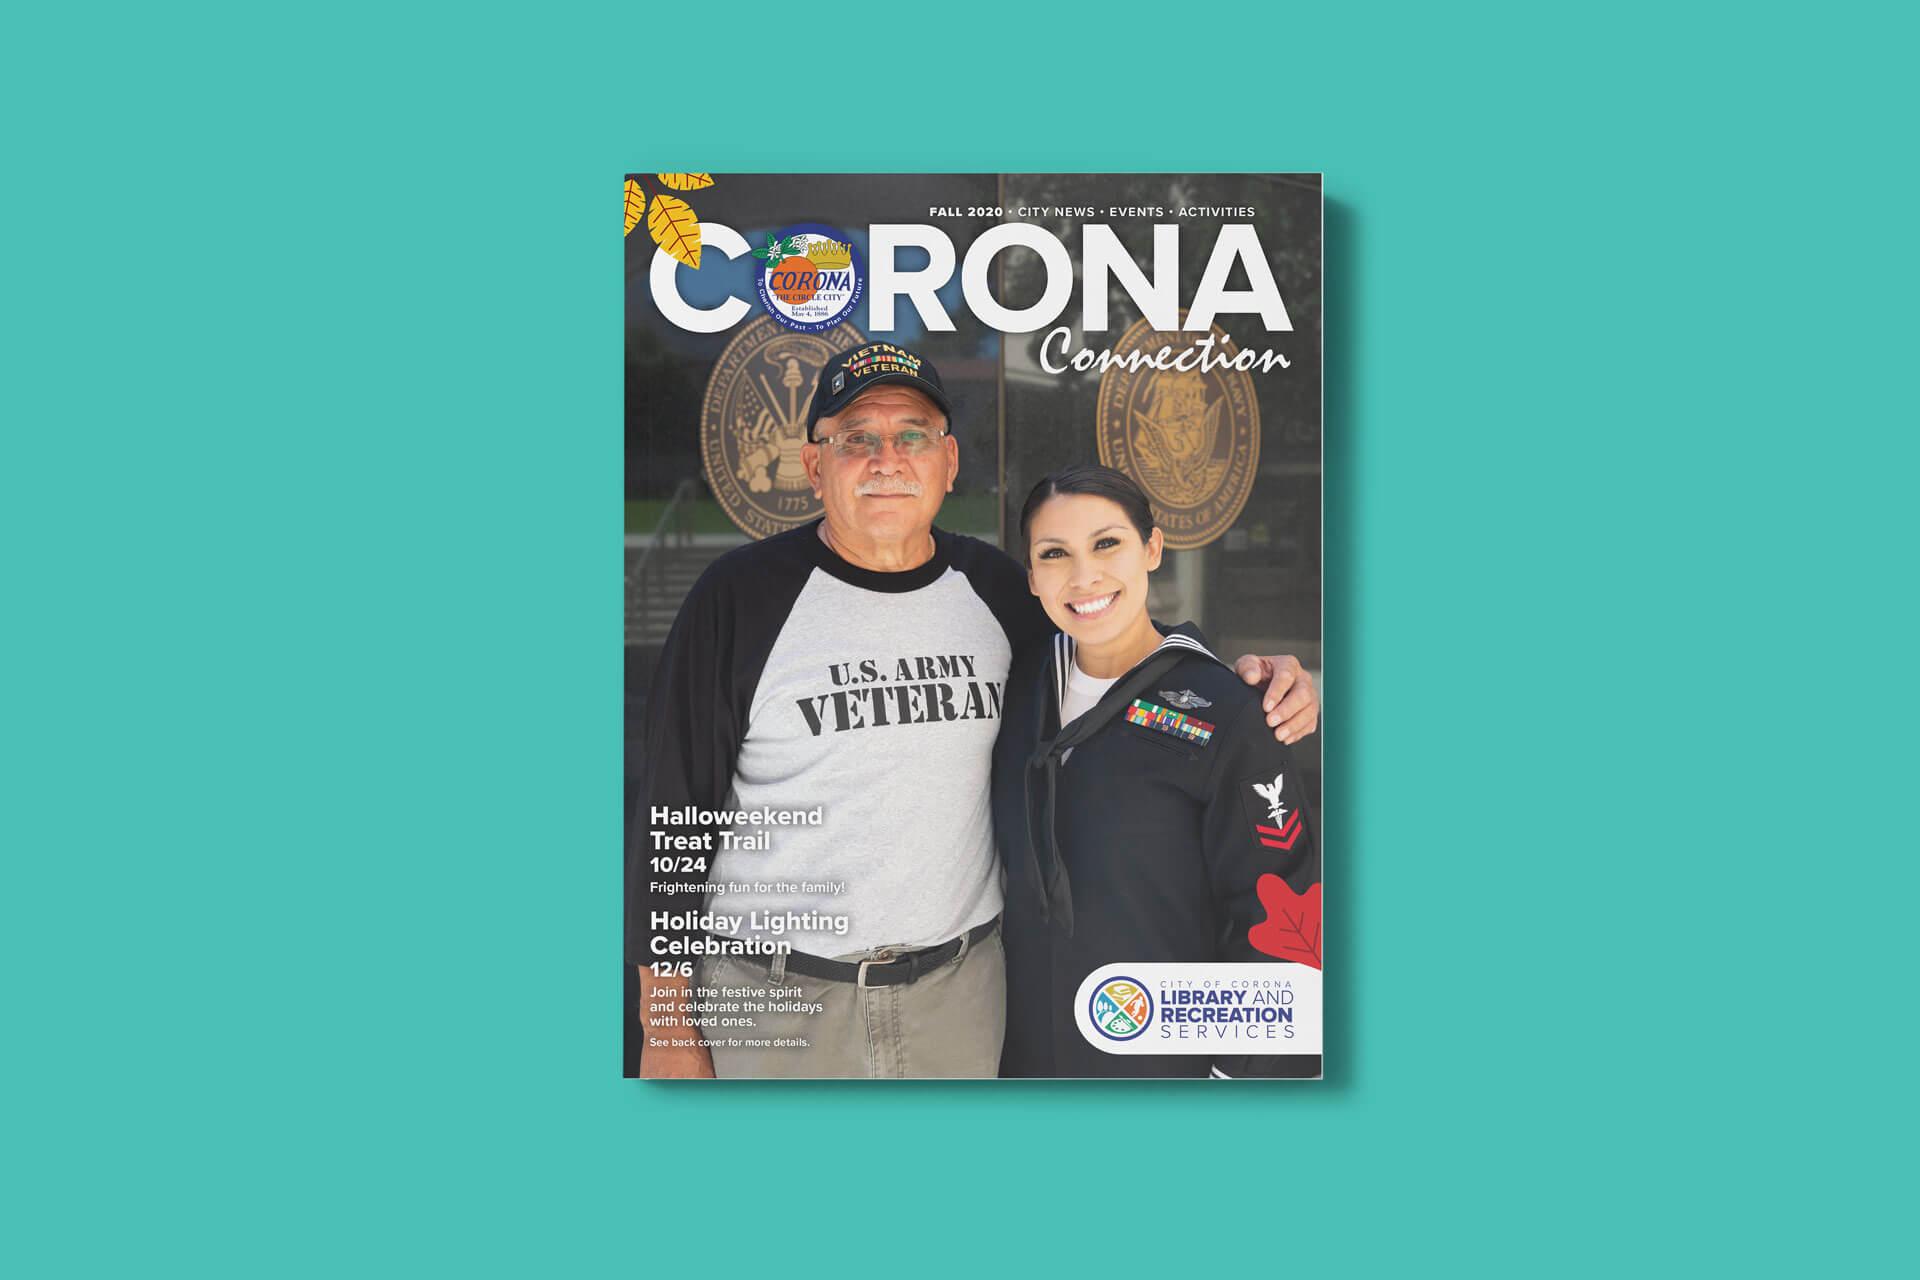 Corona Connection